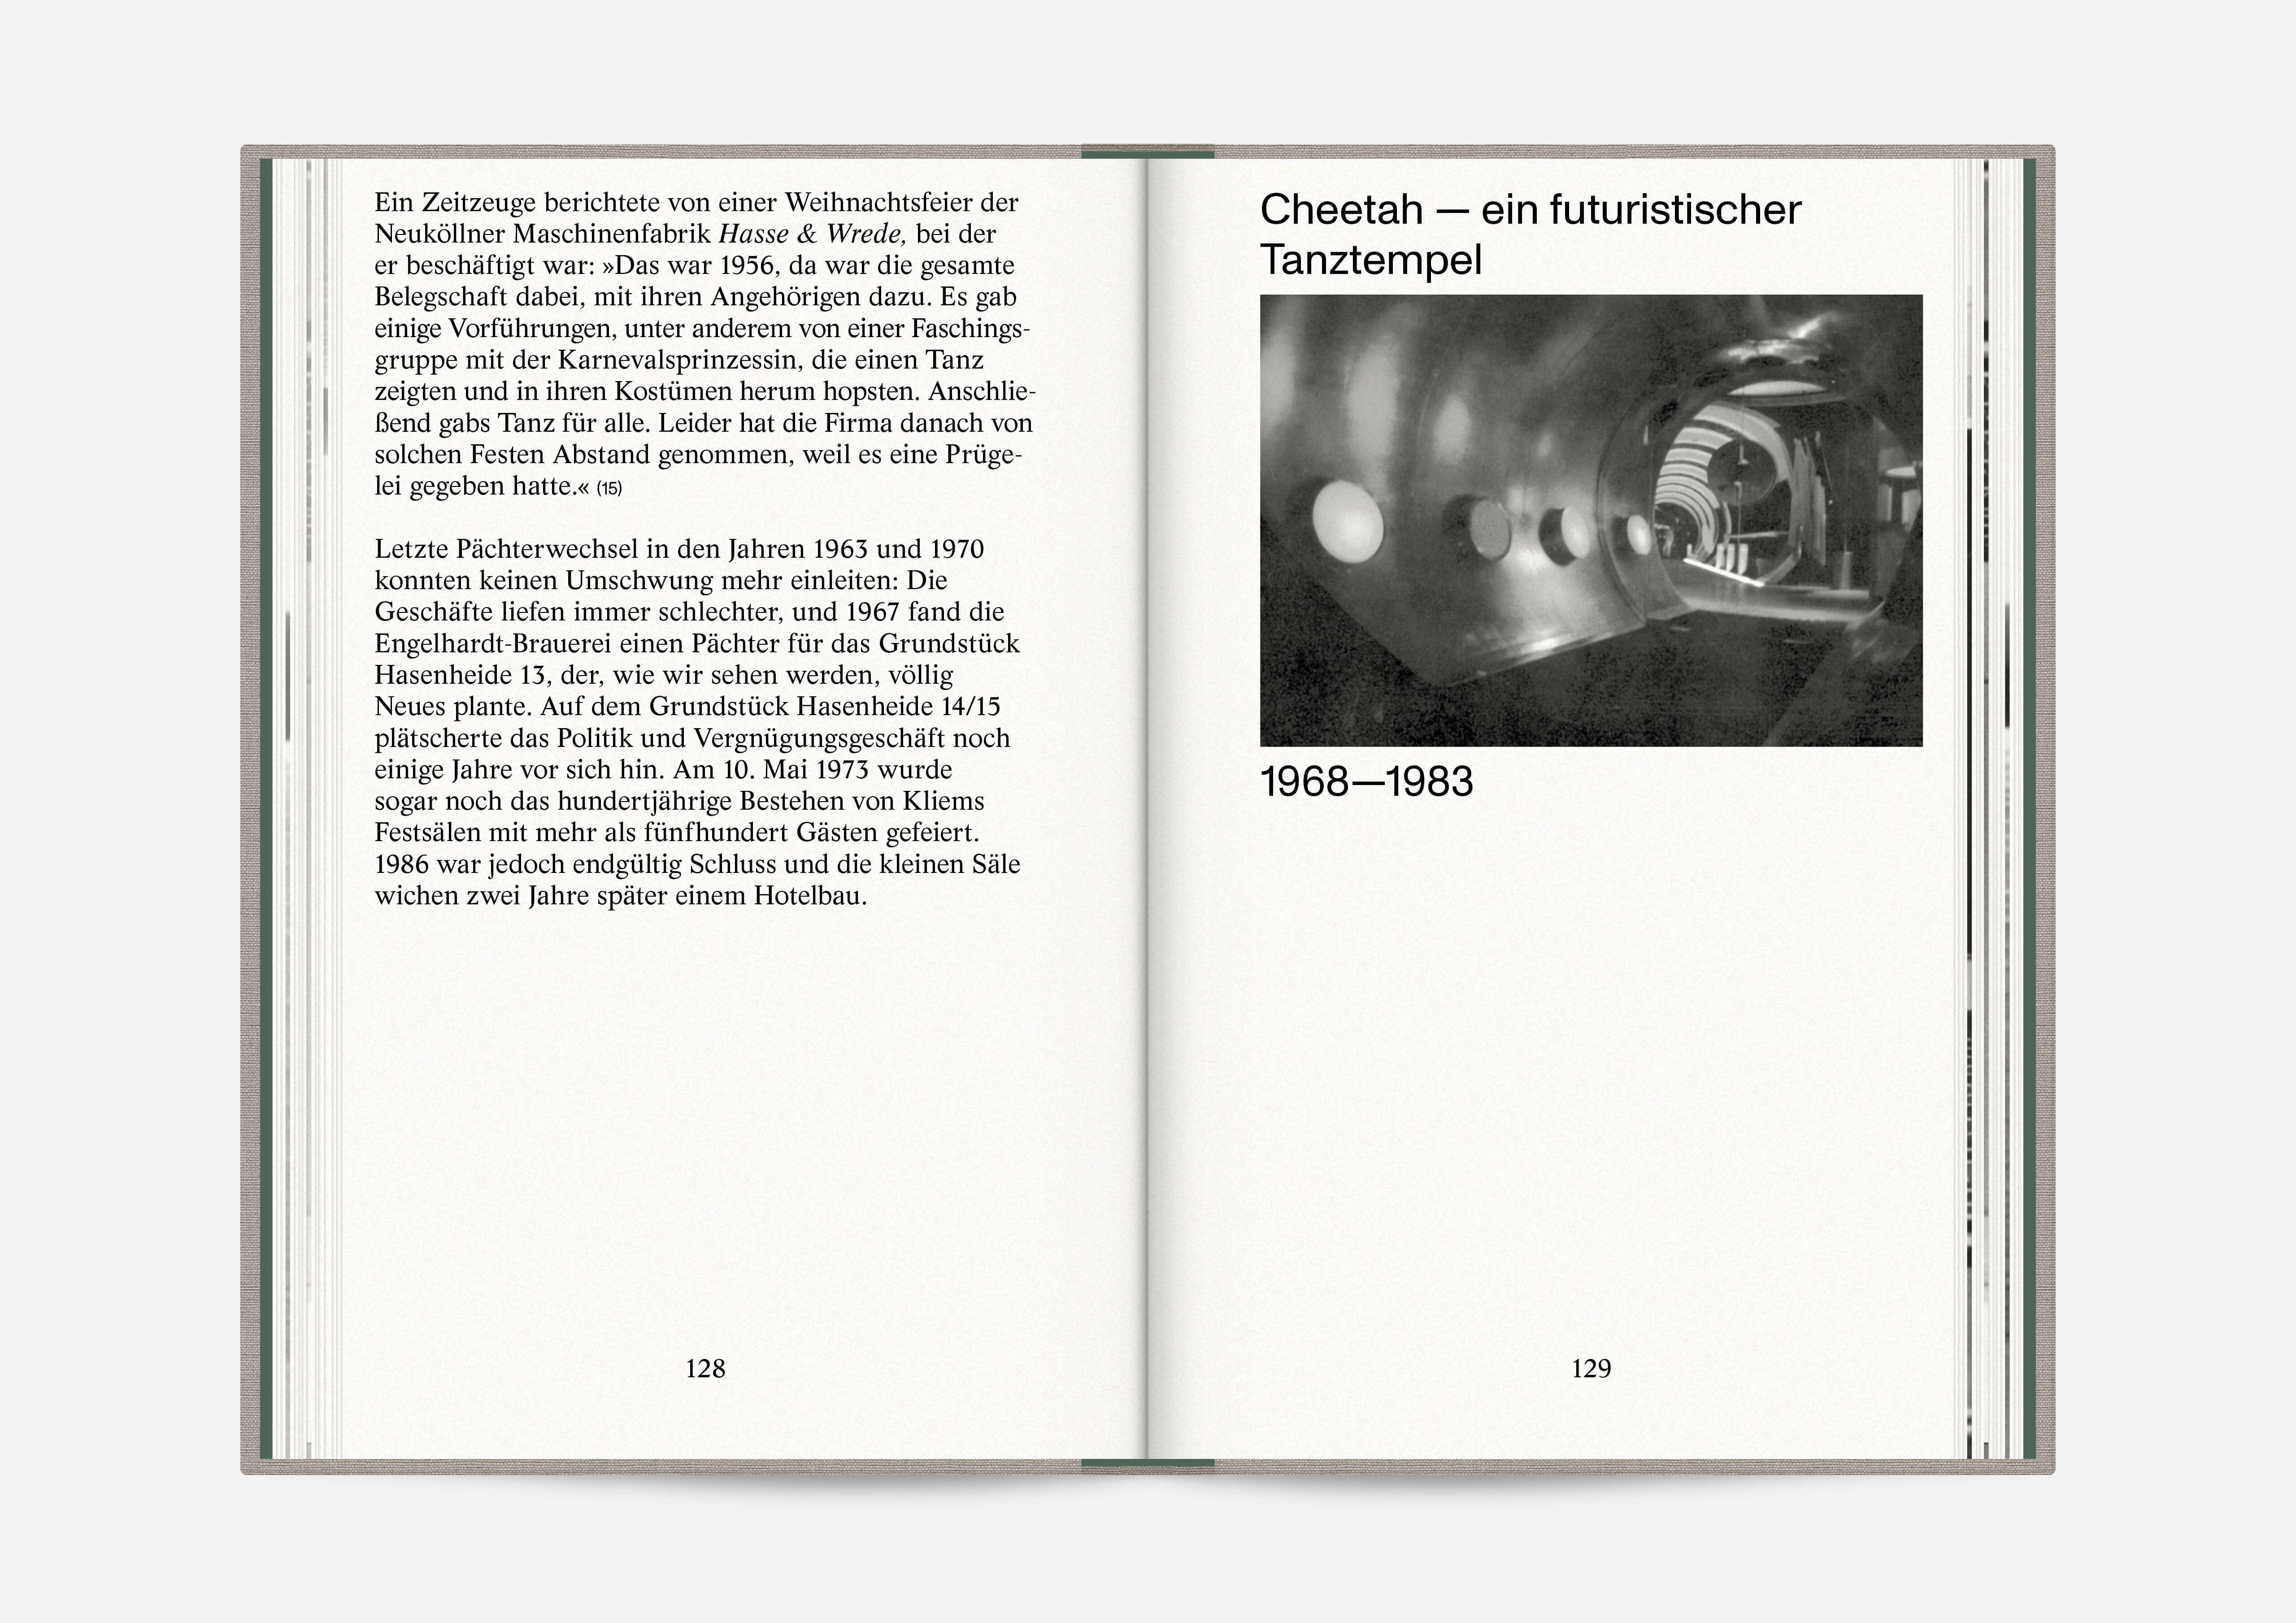 https://neuegestaltung.de/media/pages/clients/sammlung-wemhoner-hasenheide-13/4a7d1c4cc9-1628761384/sw-hasenheide_24.jpg